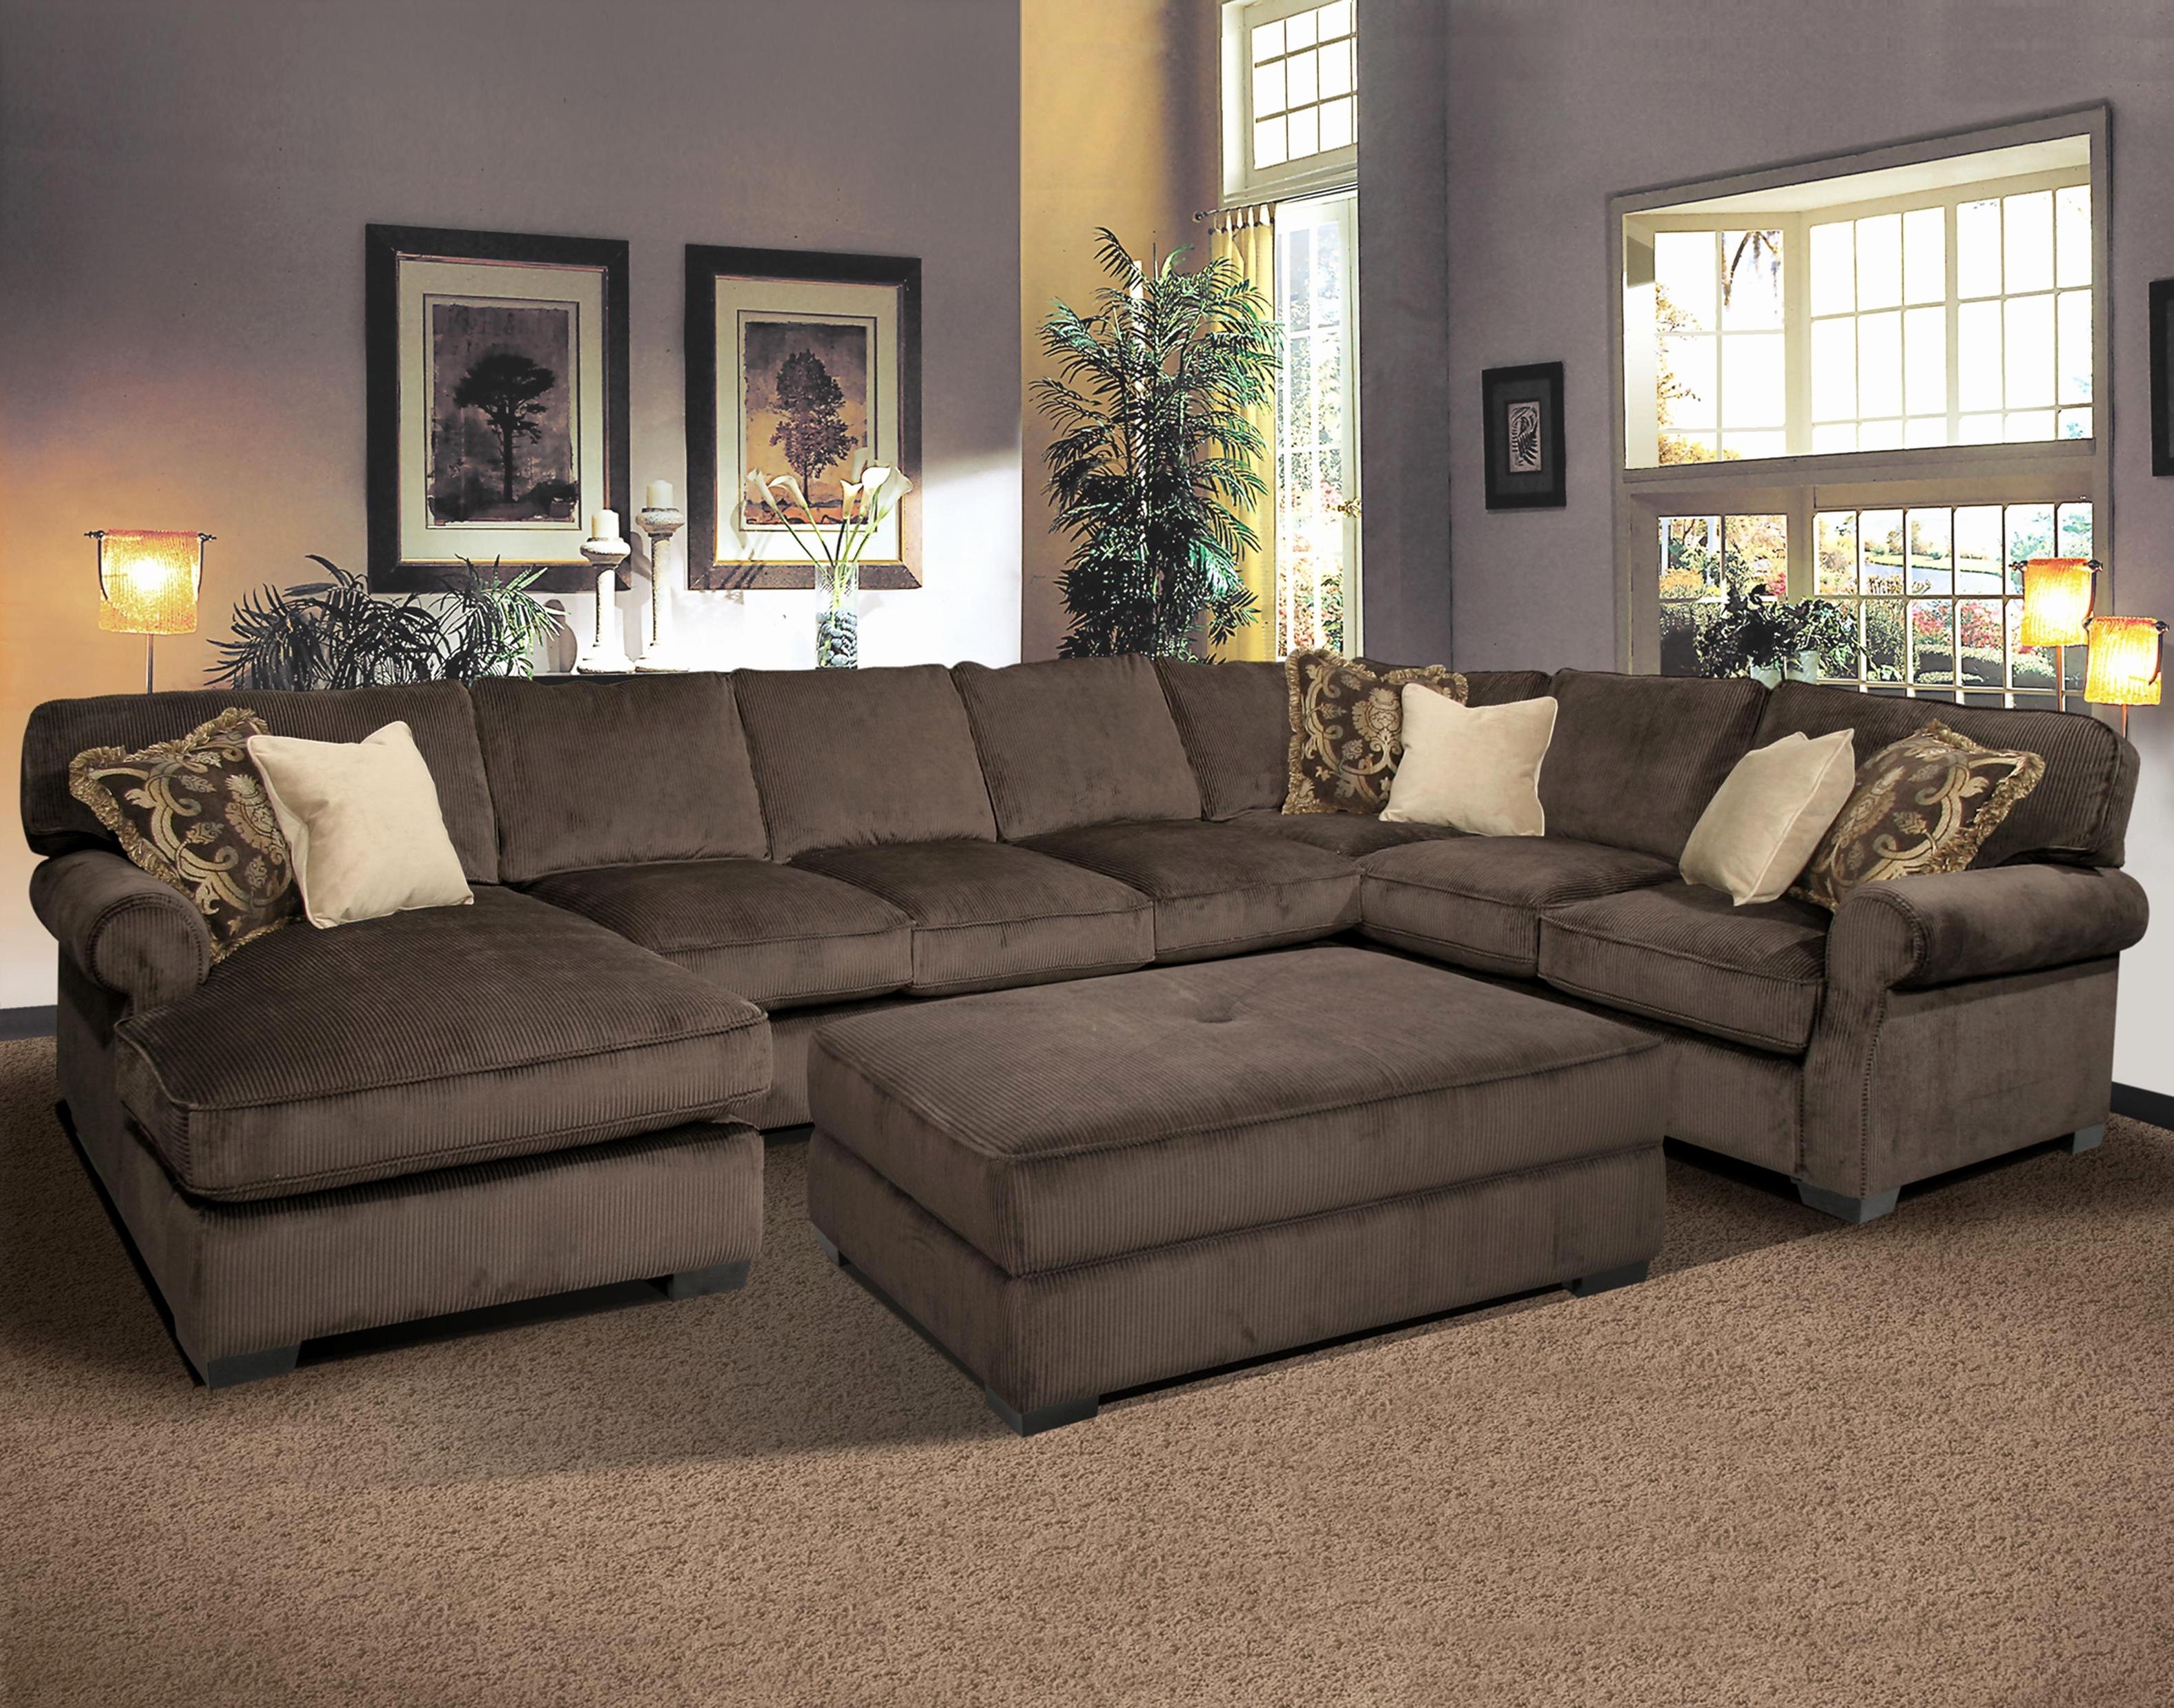 Sofas : Corner Sofa 2 Seater Sofa Quality Sofa Brands High Quality Pertaining To Newest Quality Sectional Sofas (View 10 of 20)